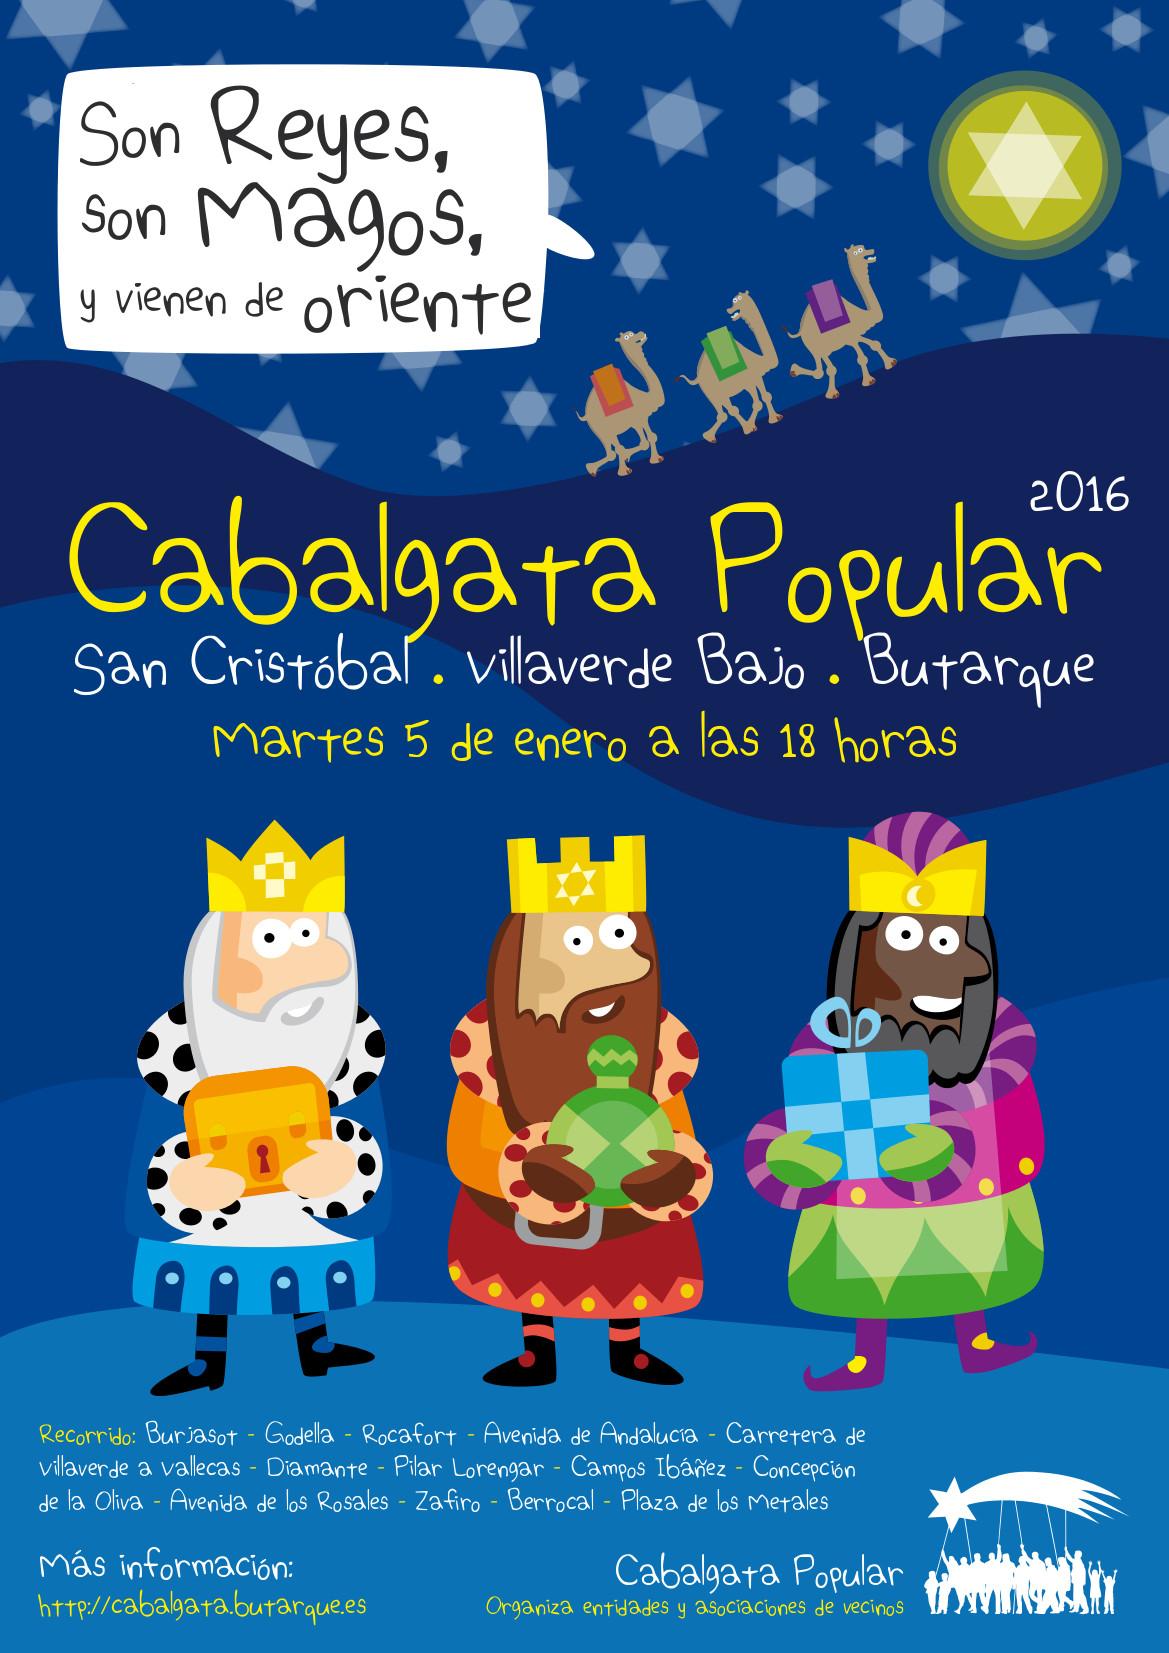 Cartel de la Cabalgata Popular de Villaverde 2016